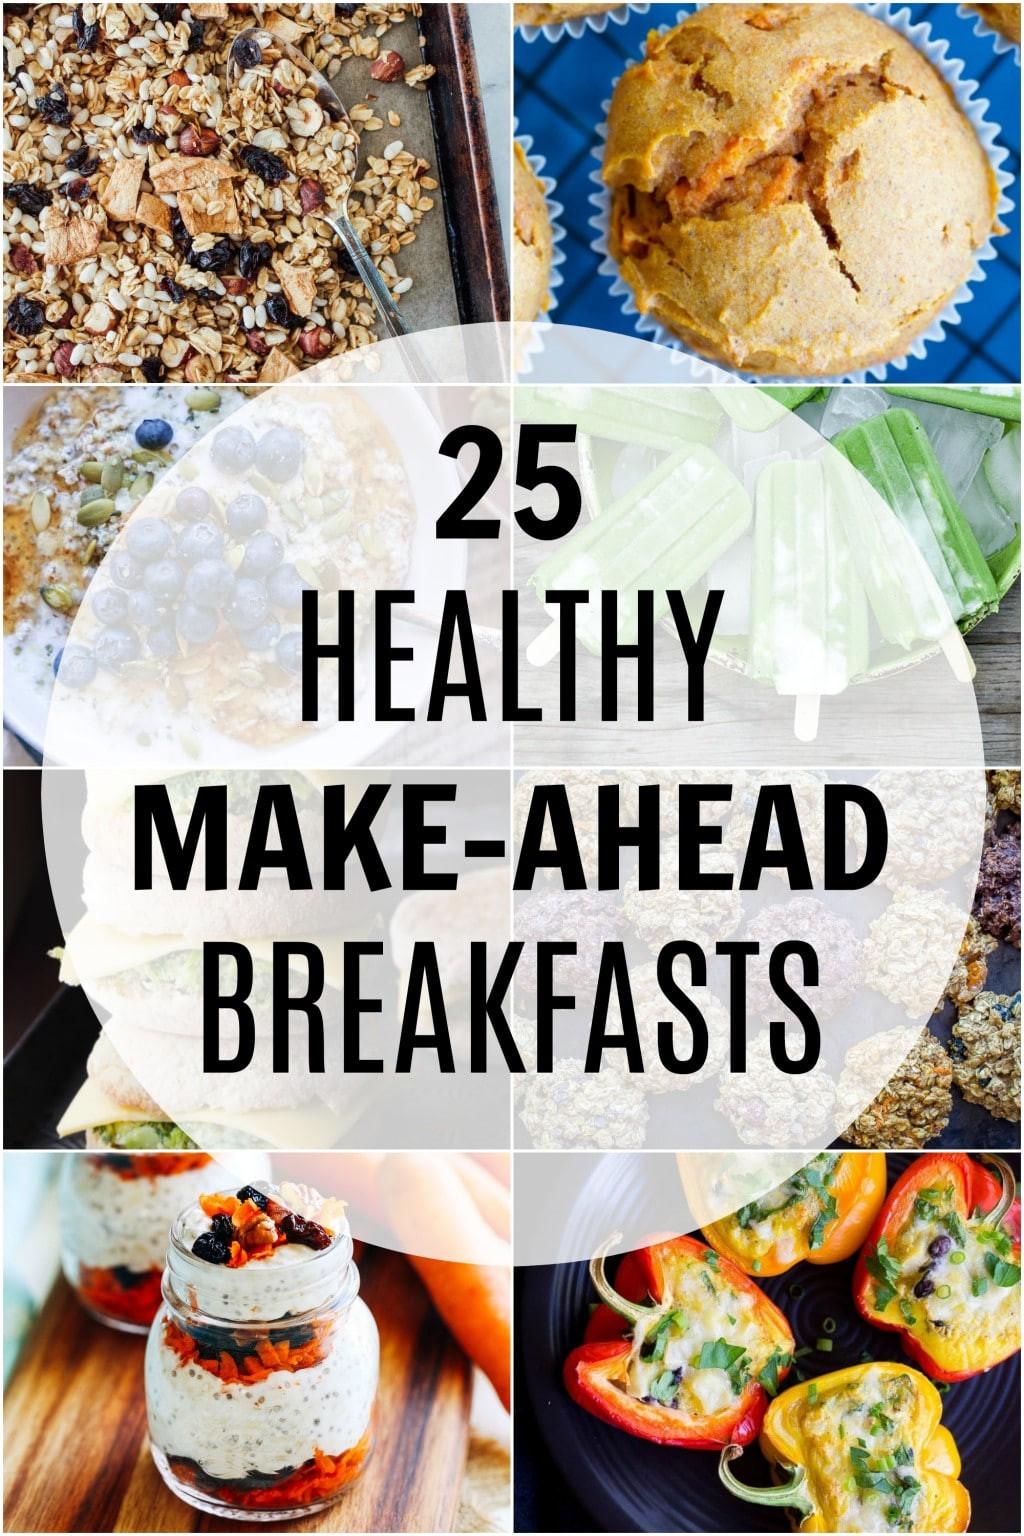 Healthy Make Ahead Breakfast  25 Healthy Make Ahead Breakfast Recipes She Likes Food